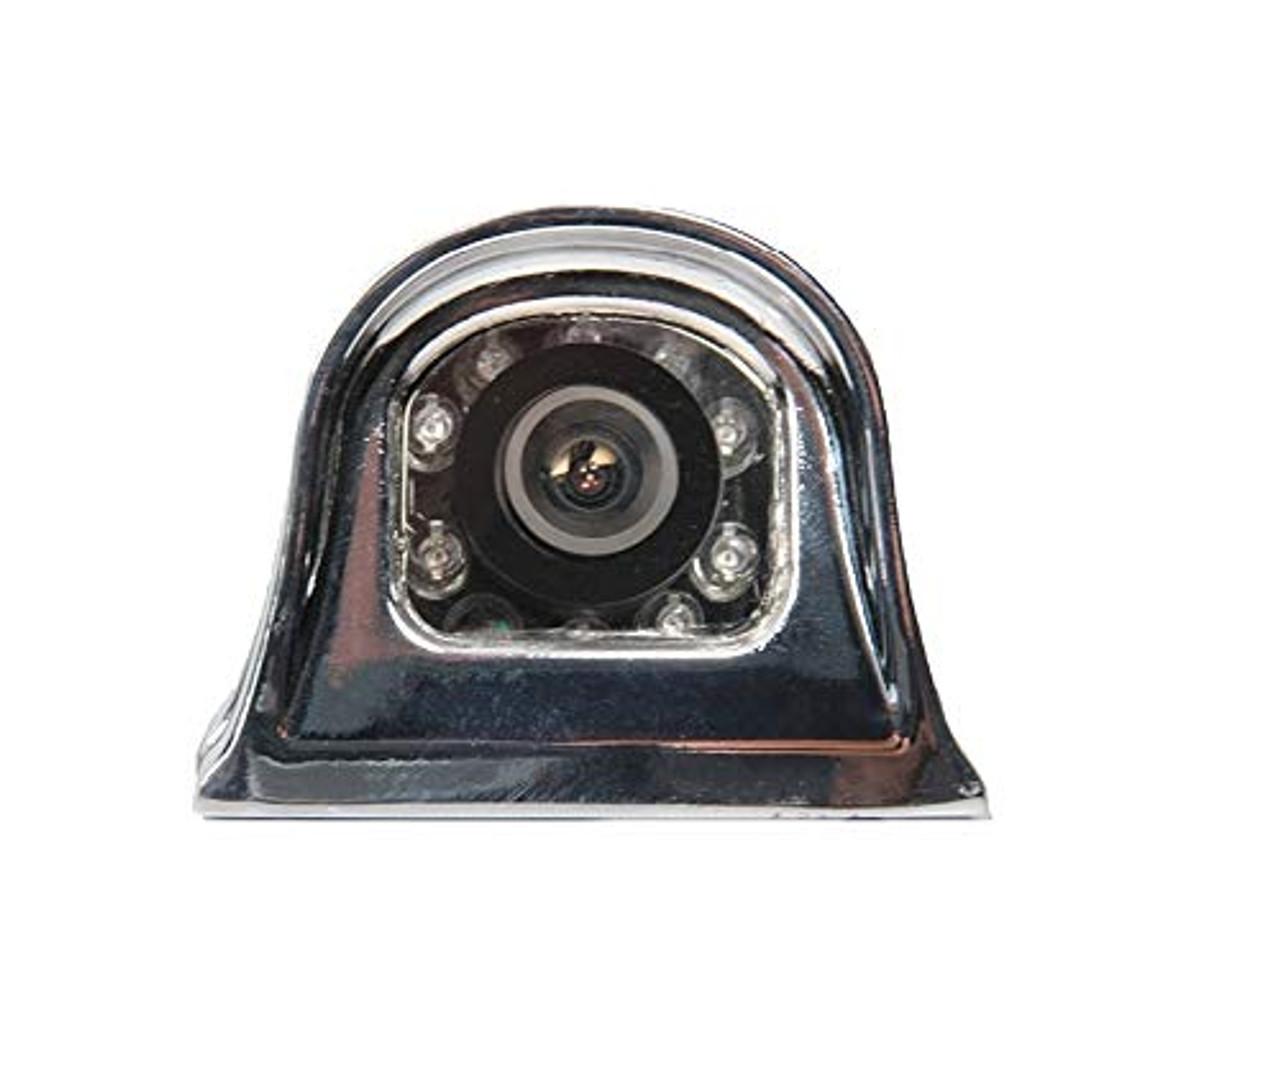 Chrome Left Side Camera, 33' Cable, RCA Adapter | 1016VYNX6FE